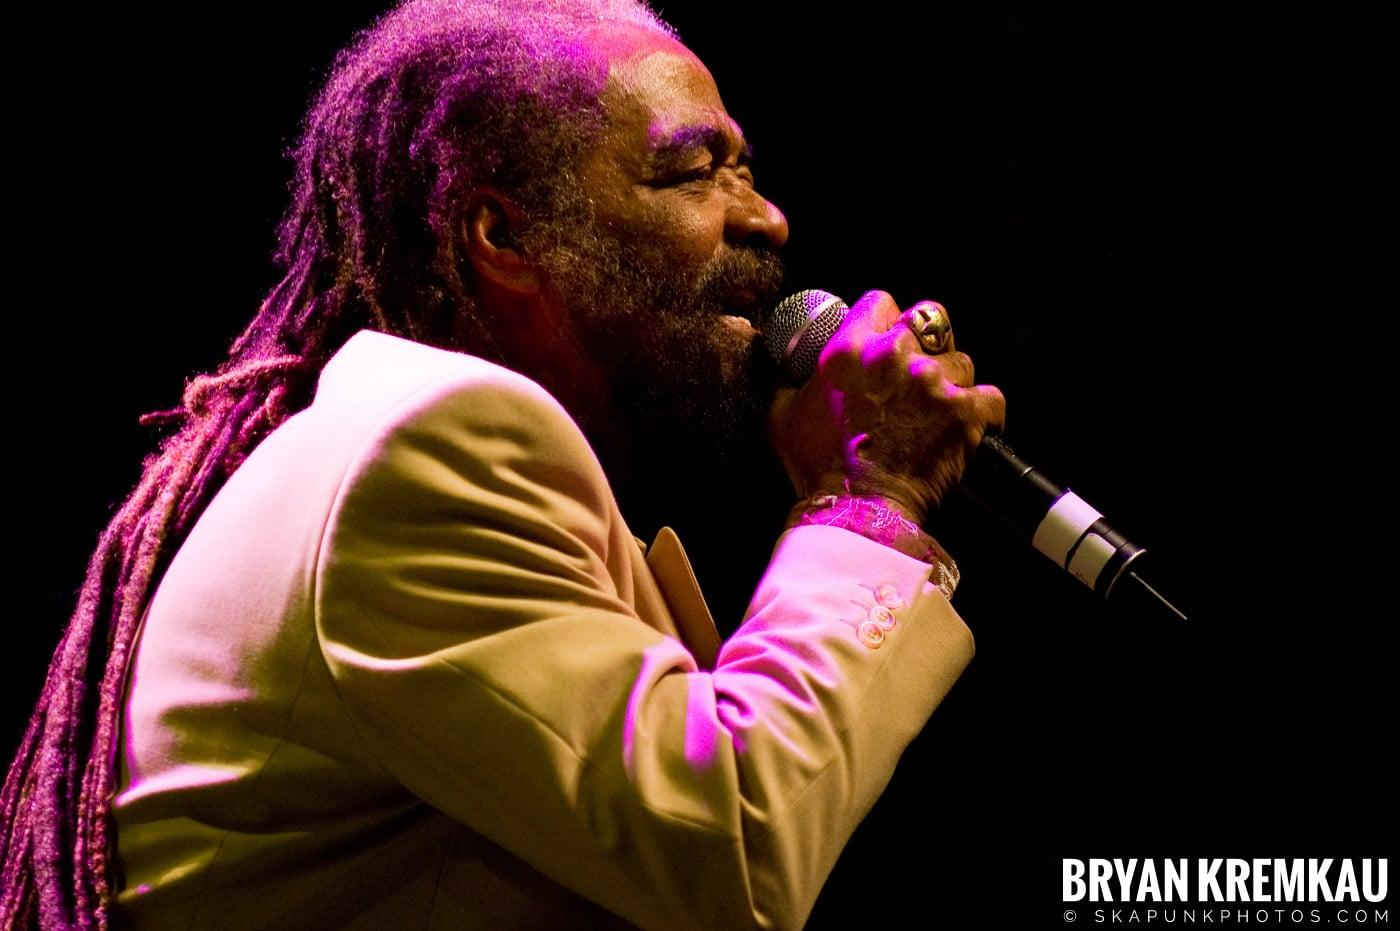 John Holt @ Vintage Reggae Fest - Hammerstein Ballroom, NYC - 12.16.07 (8)